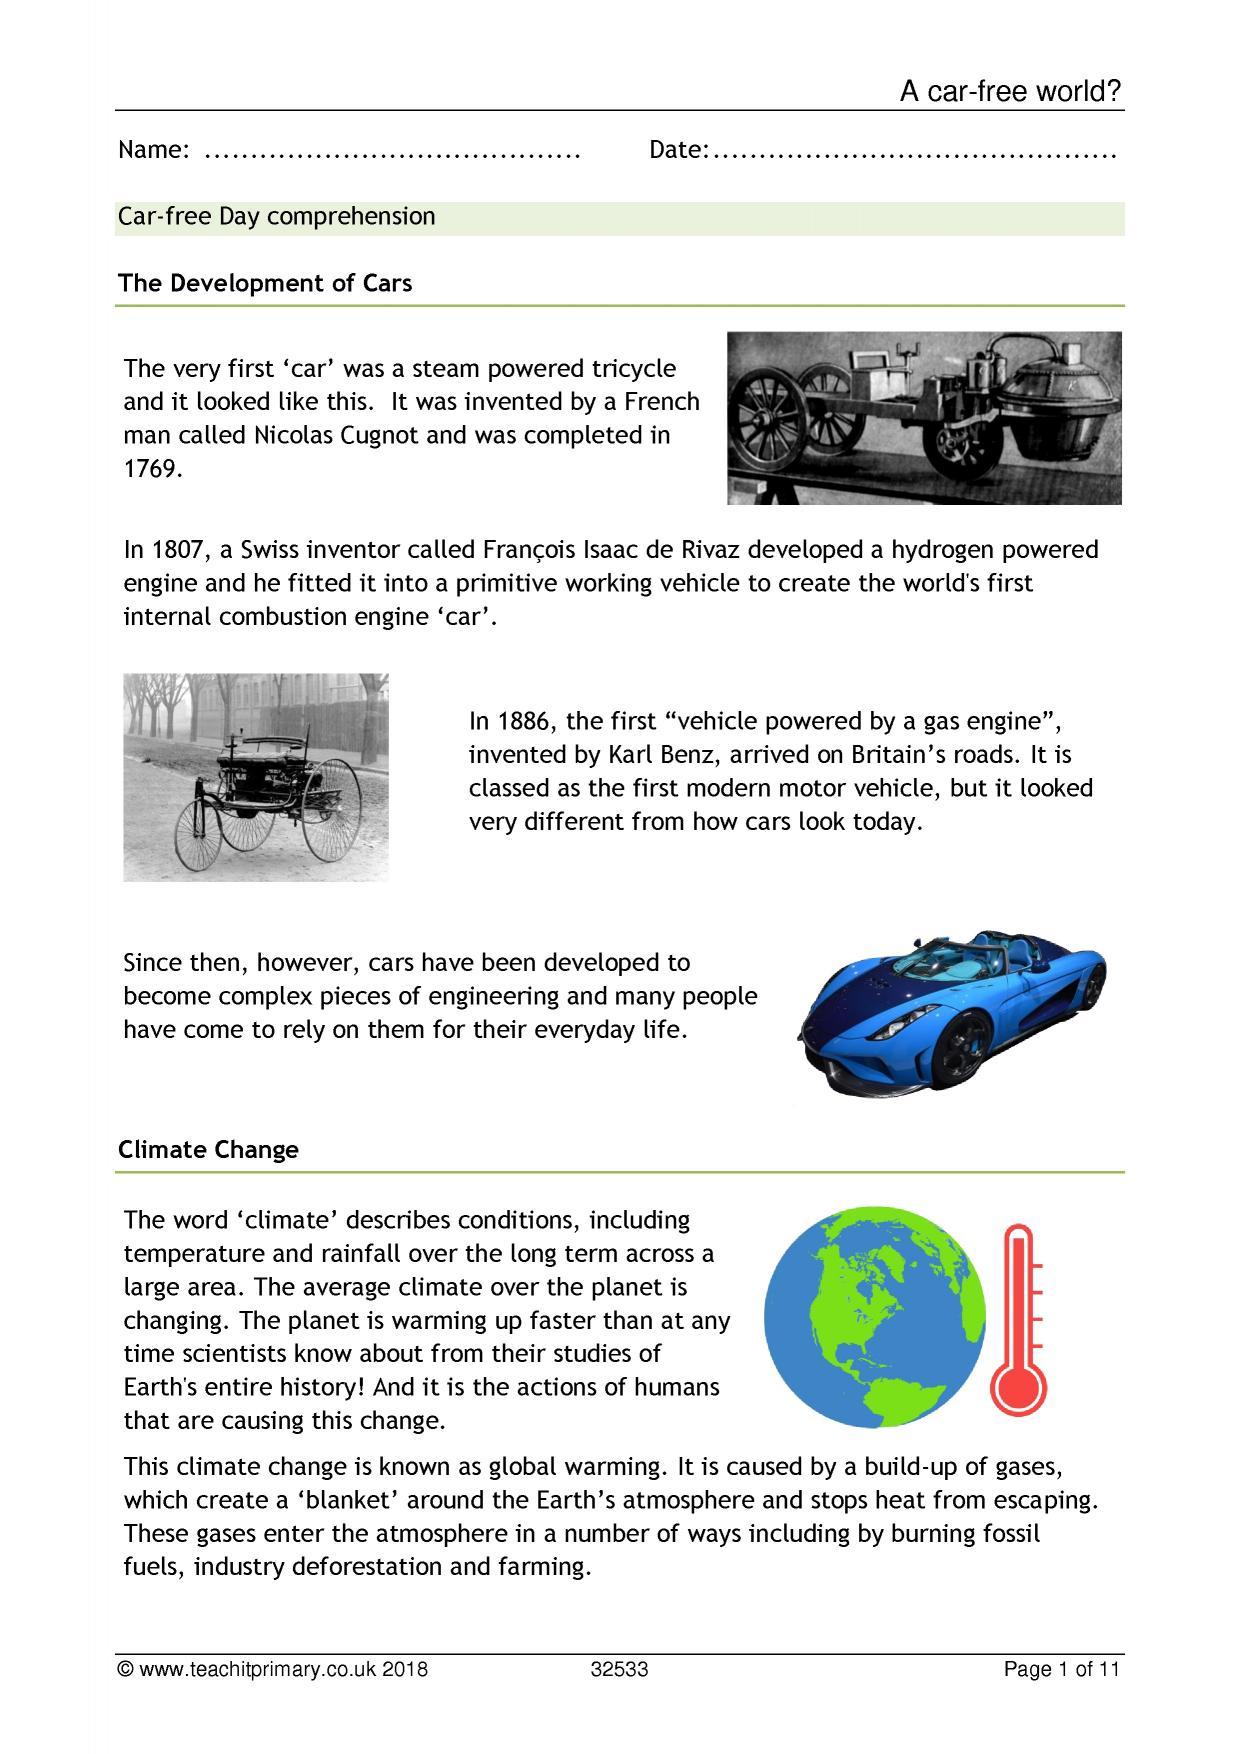 Car Free Day Comprehension